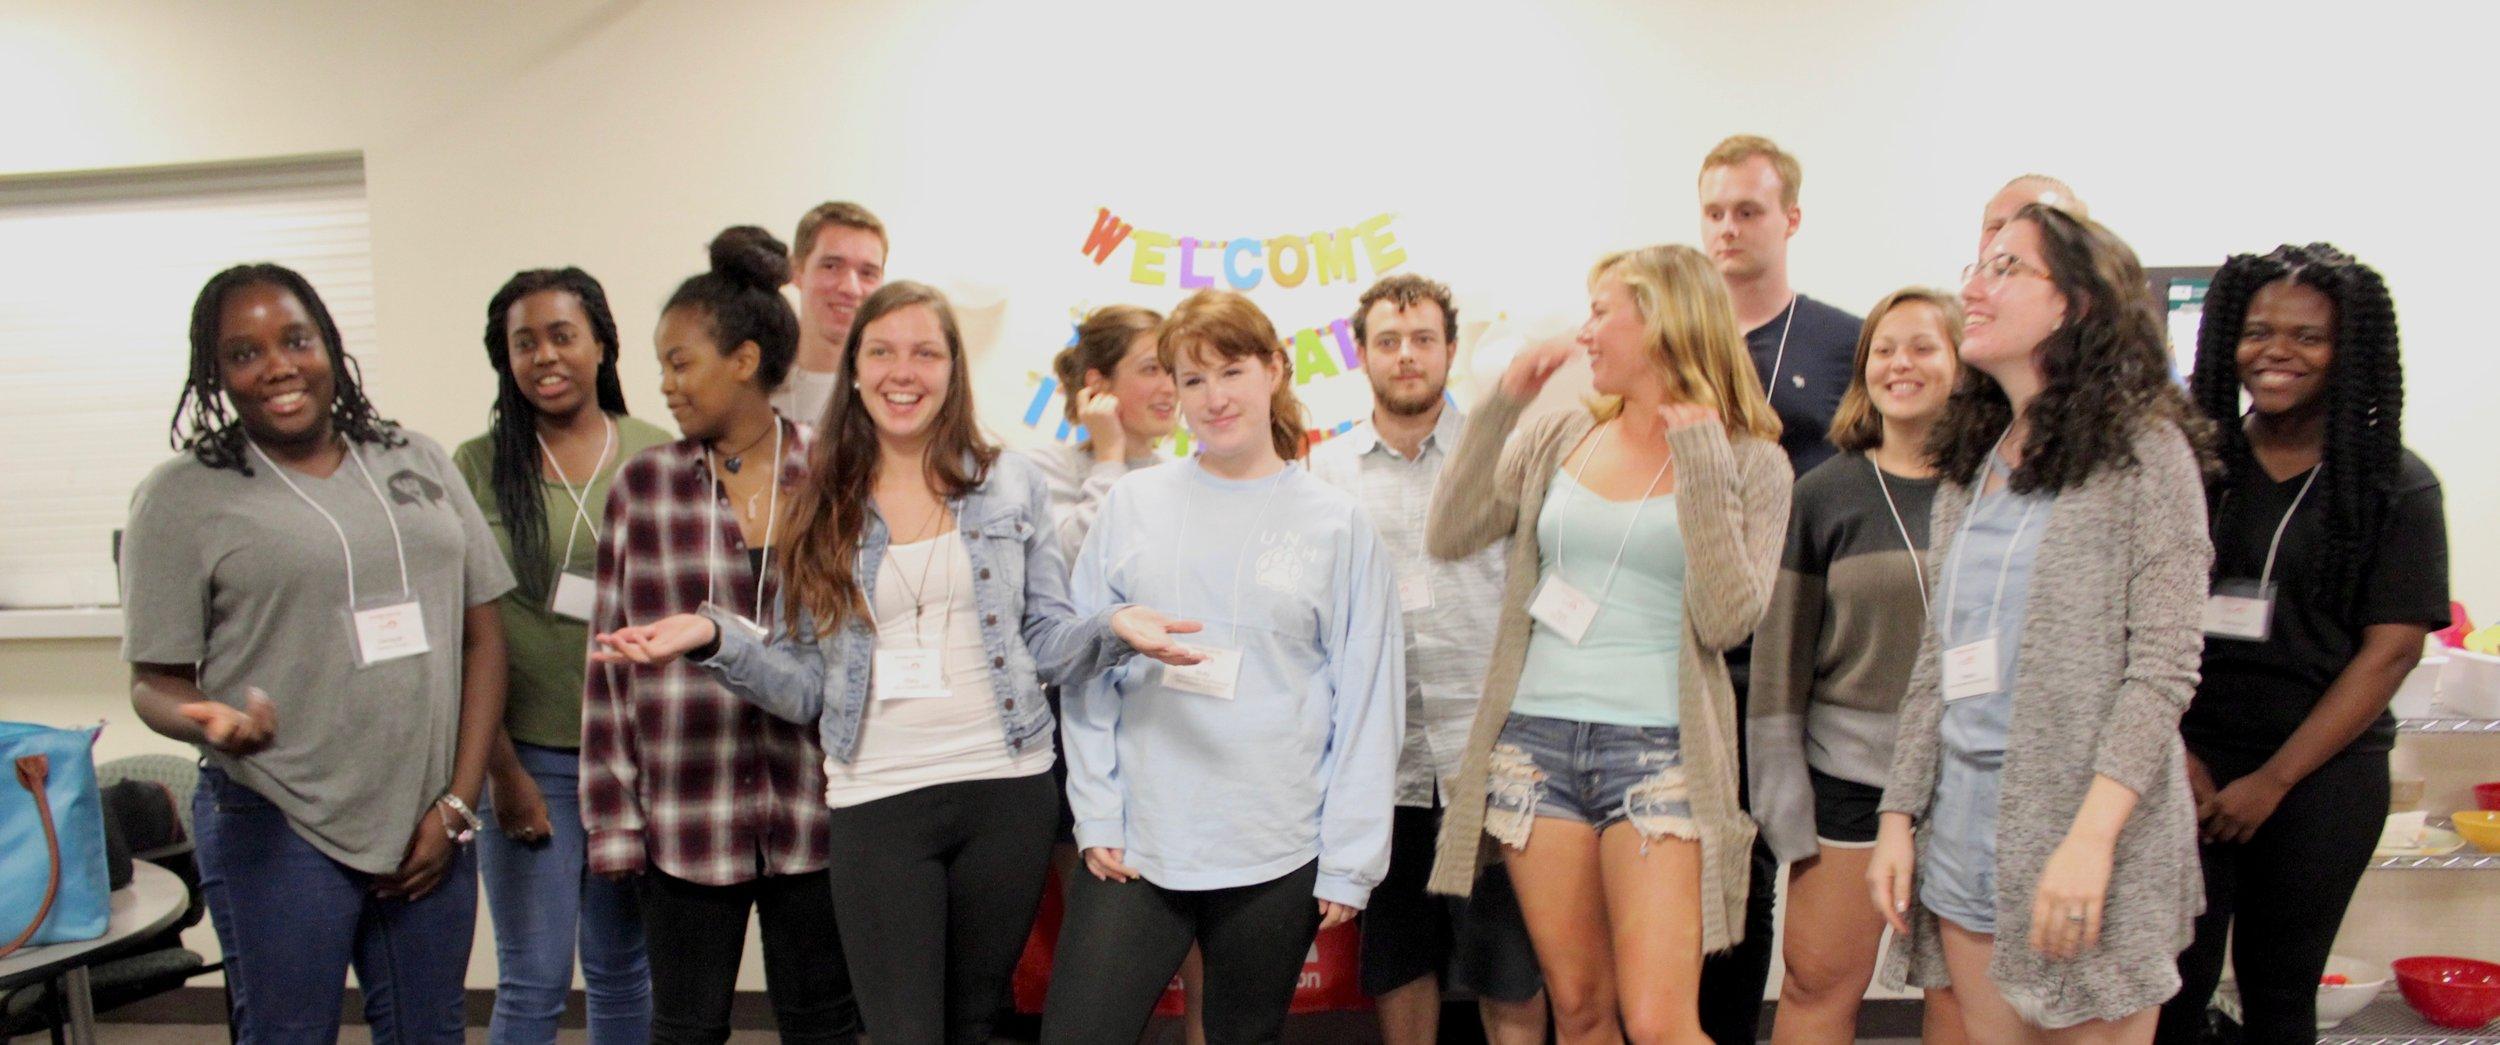 Our Founding Social Innovation Fellows - Fall 2016